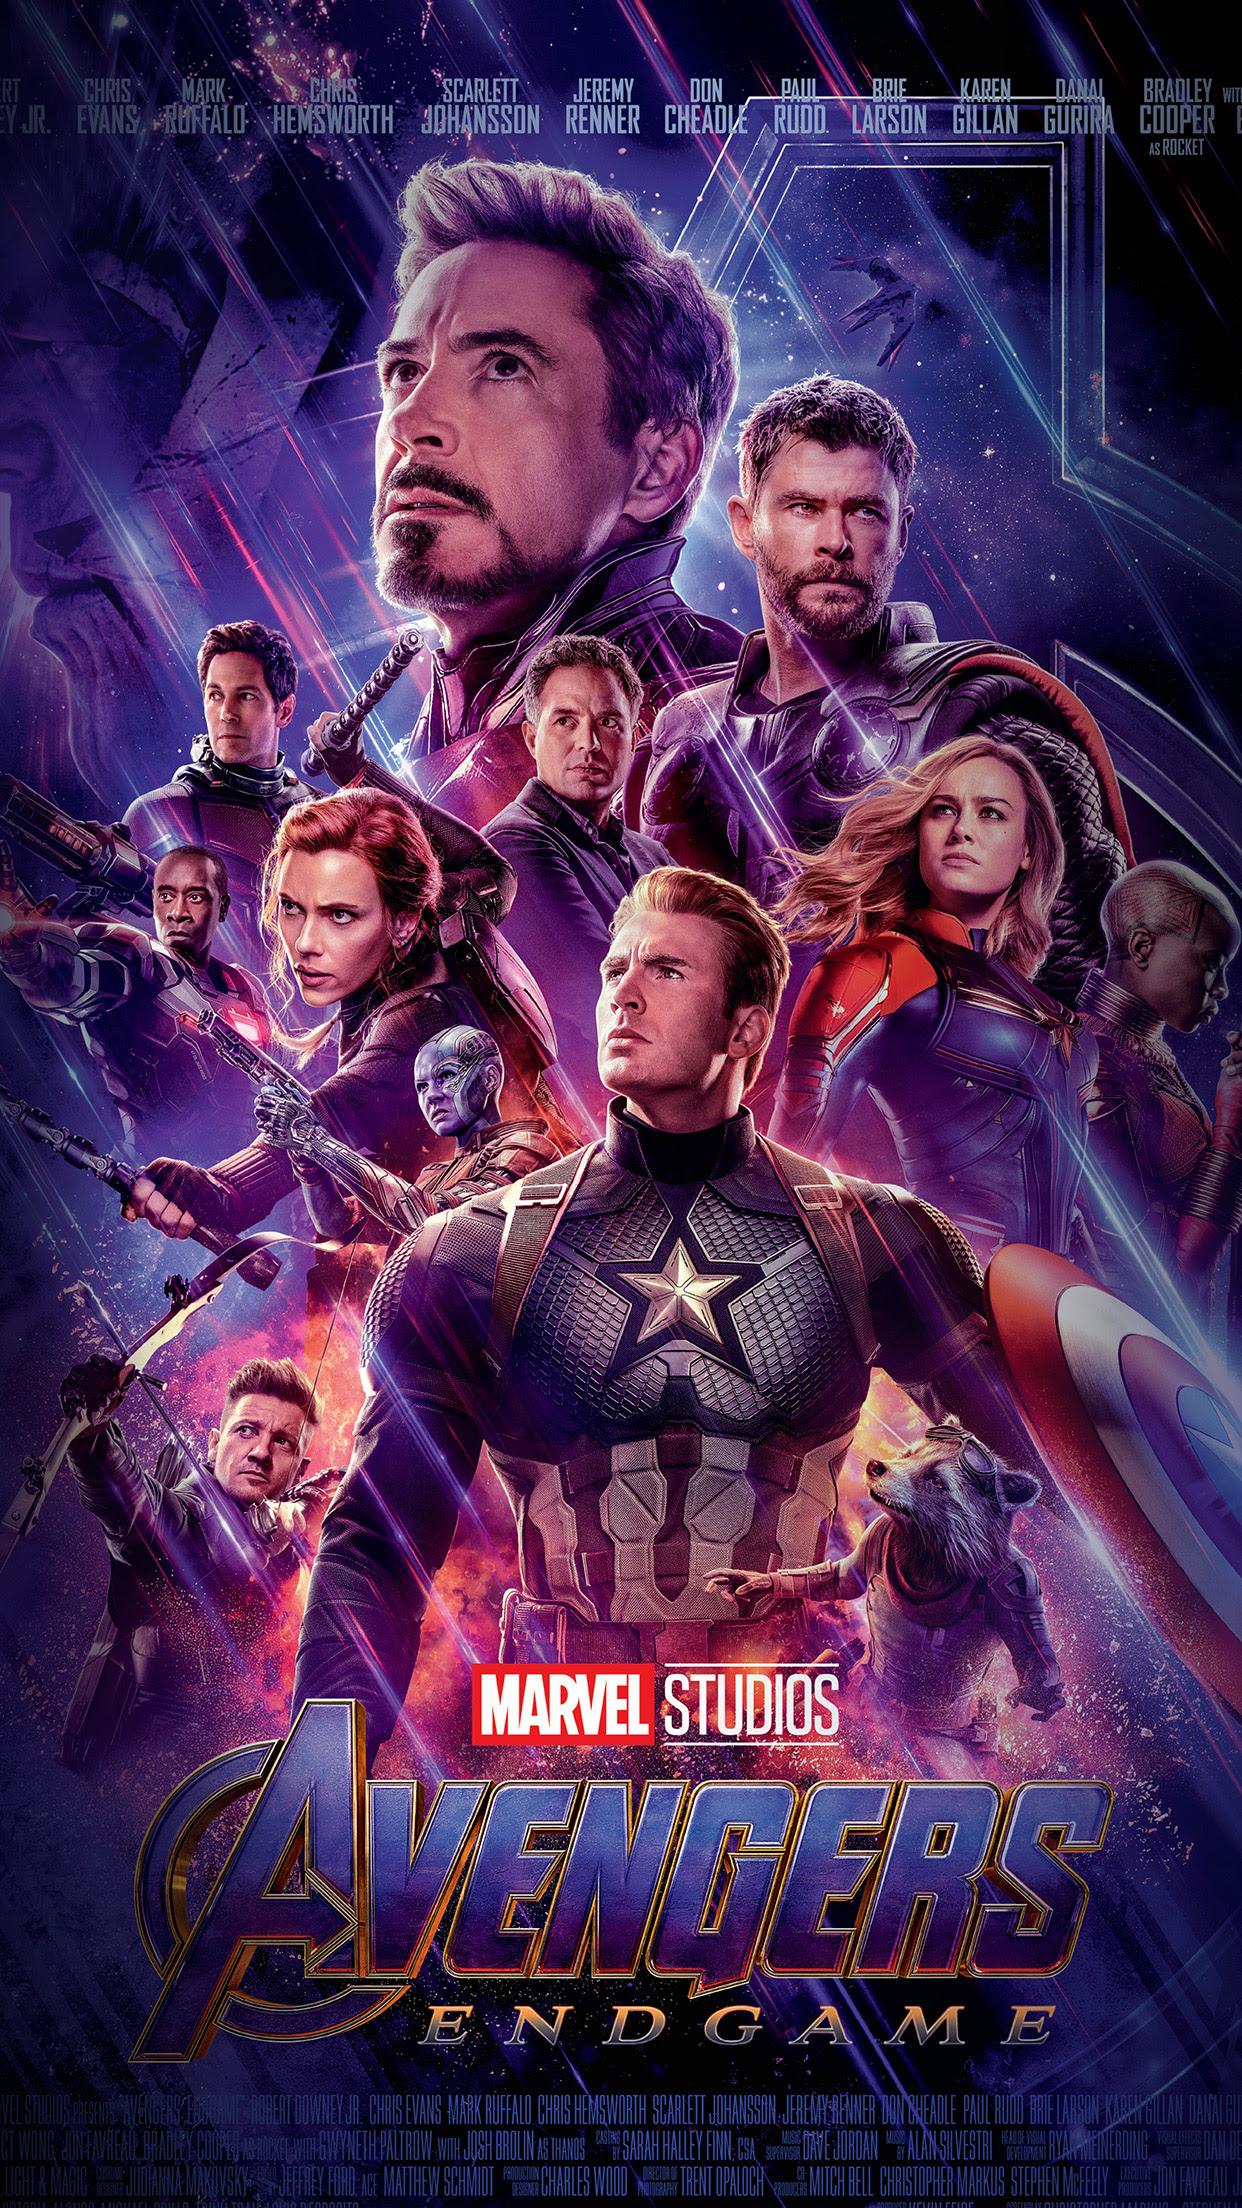 Unduh 600+ Wallpaper Iphone The Avengers HD Terbaik